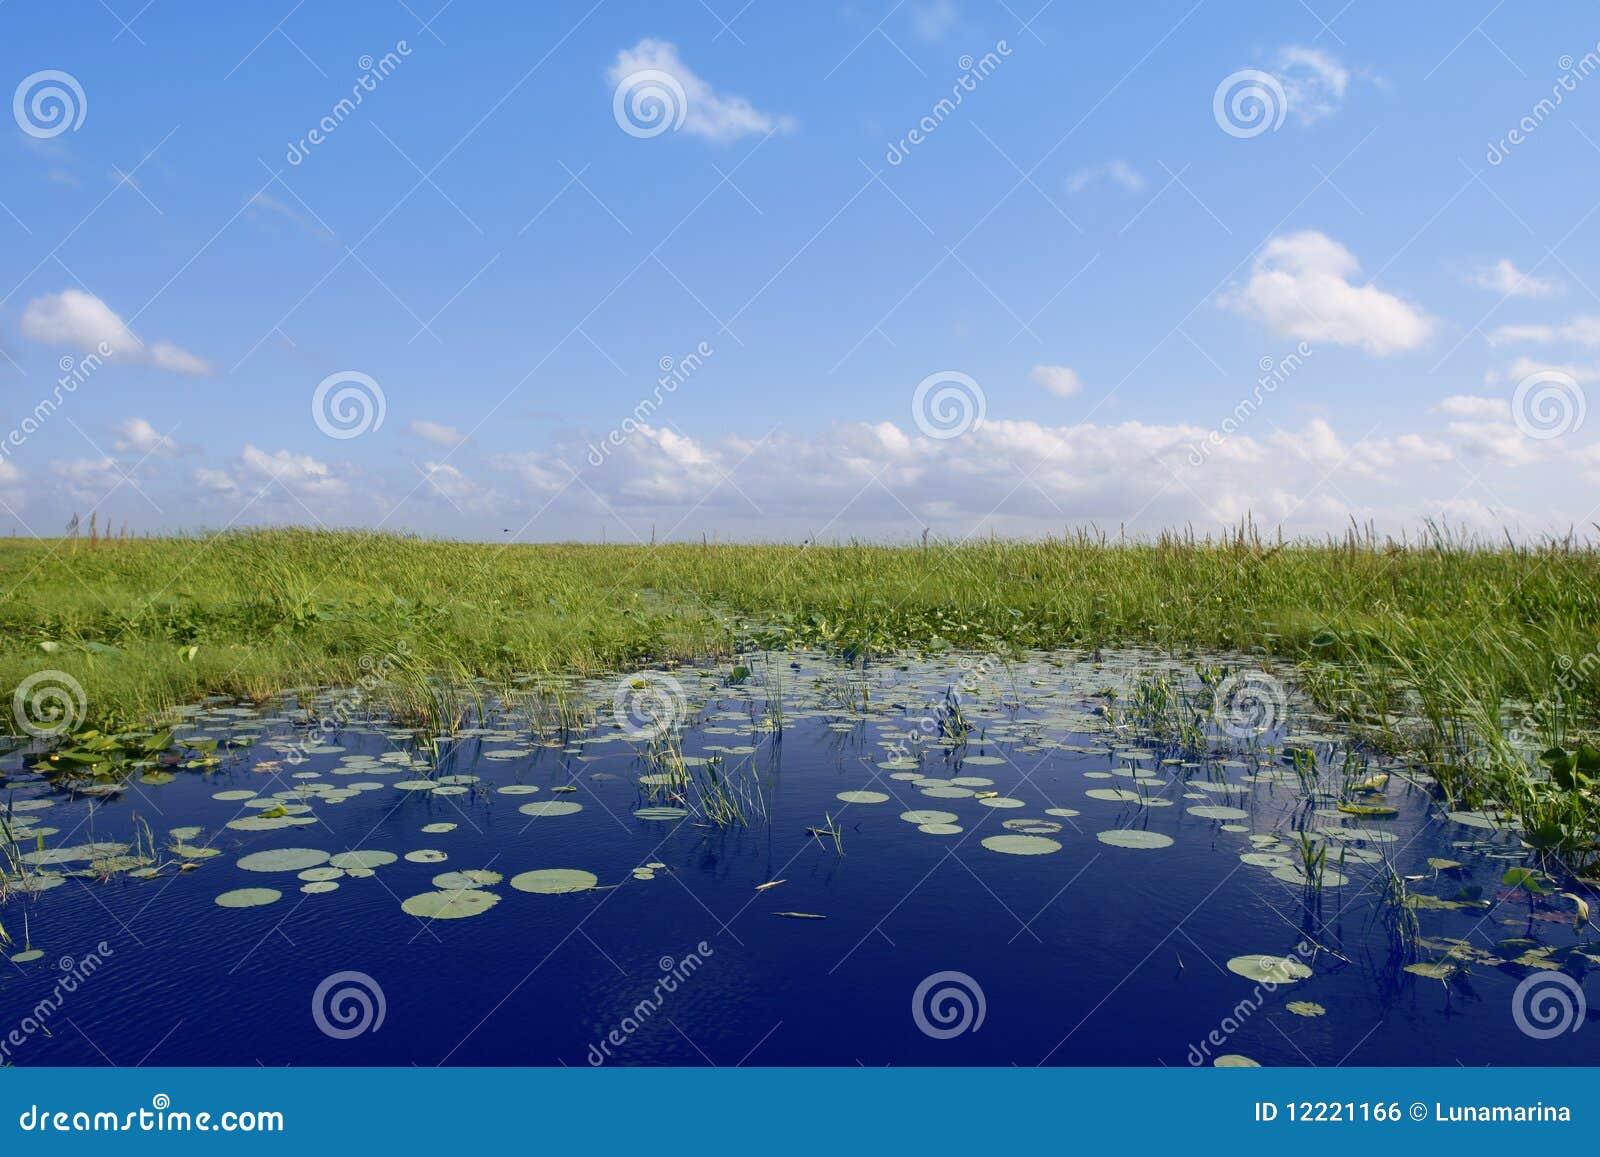 Blue sky in Florida Everglades wetlands green plan